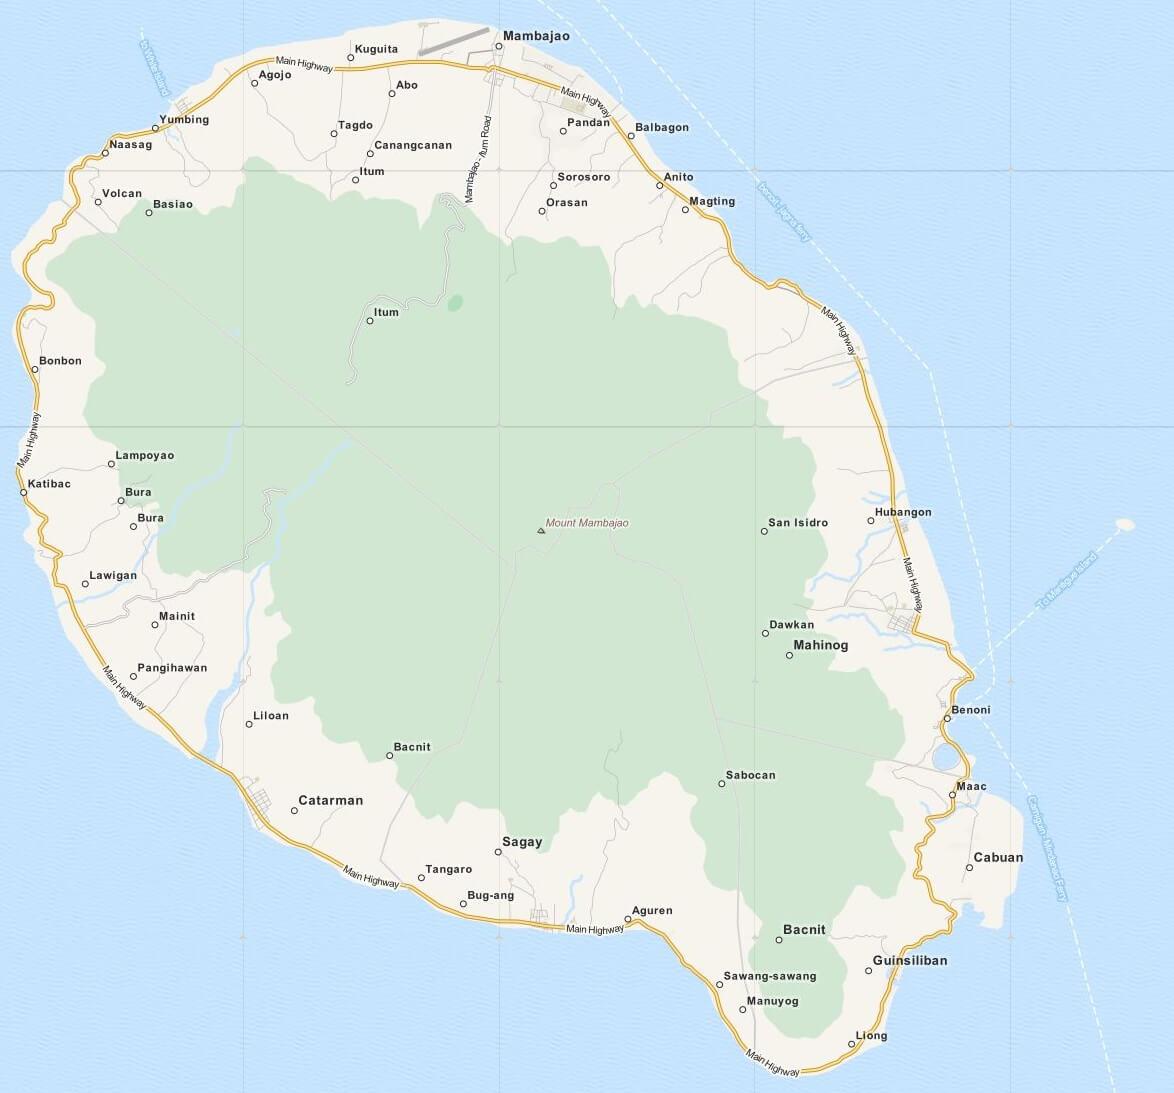 Kaart Camiguin, Mindanao, Filipijnen